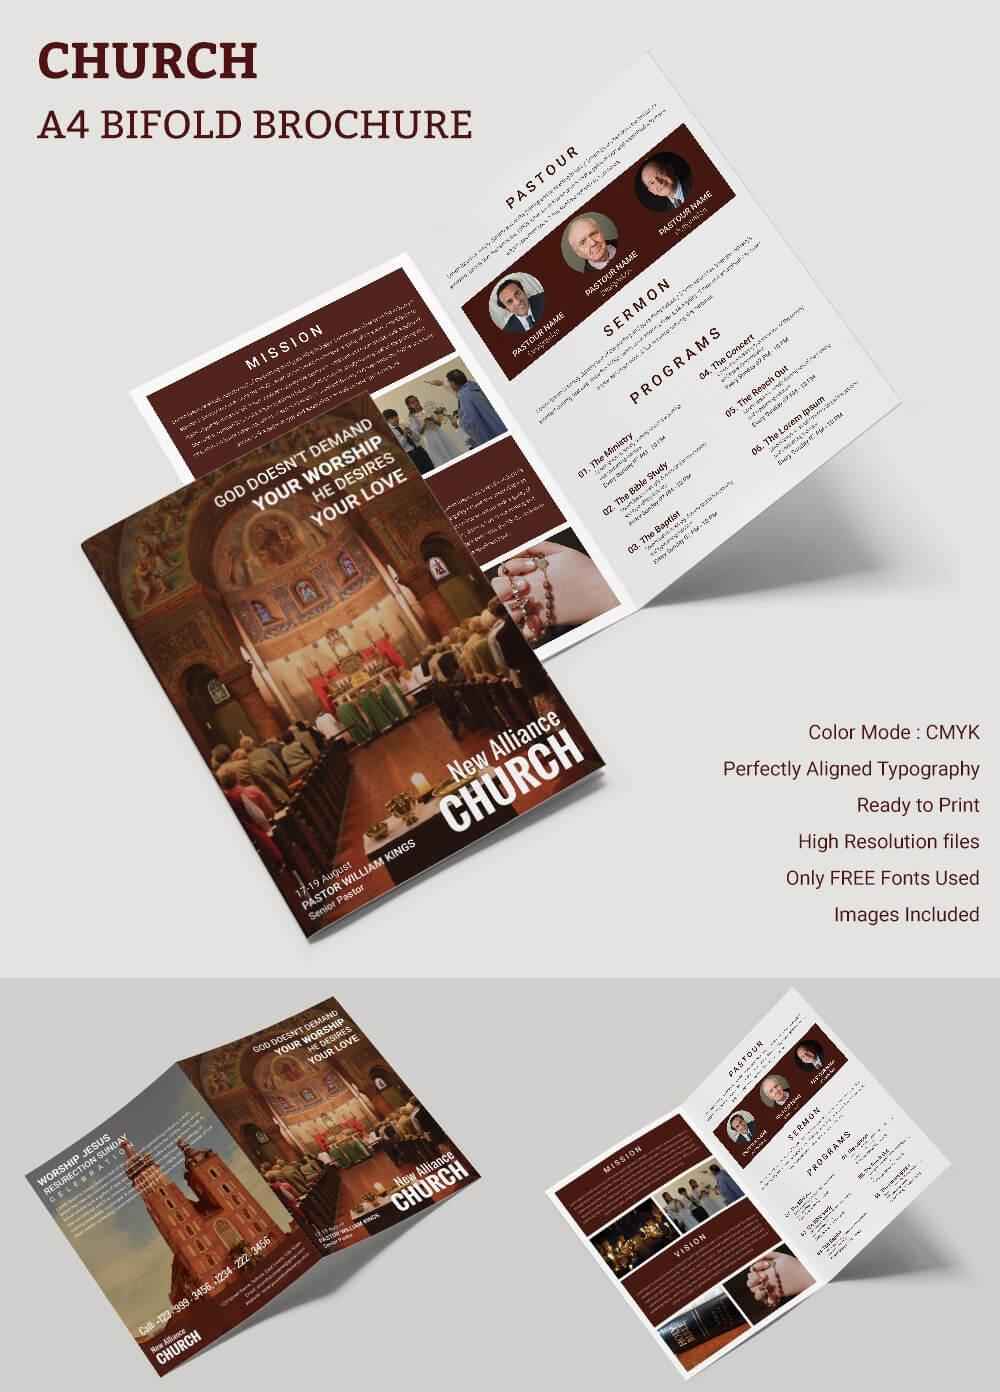 16+ Popular Church Brochure Templates – Ai,psd, Docs, Pages With Regard To Free Church Brochure Templates For Microsoft Word